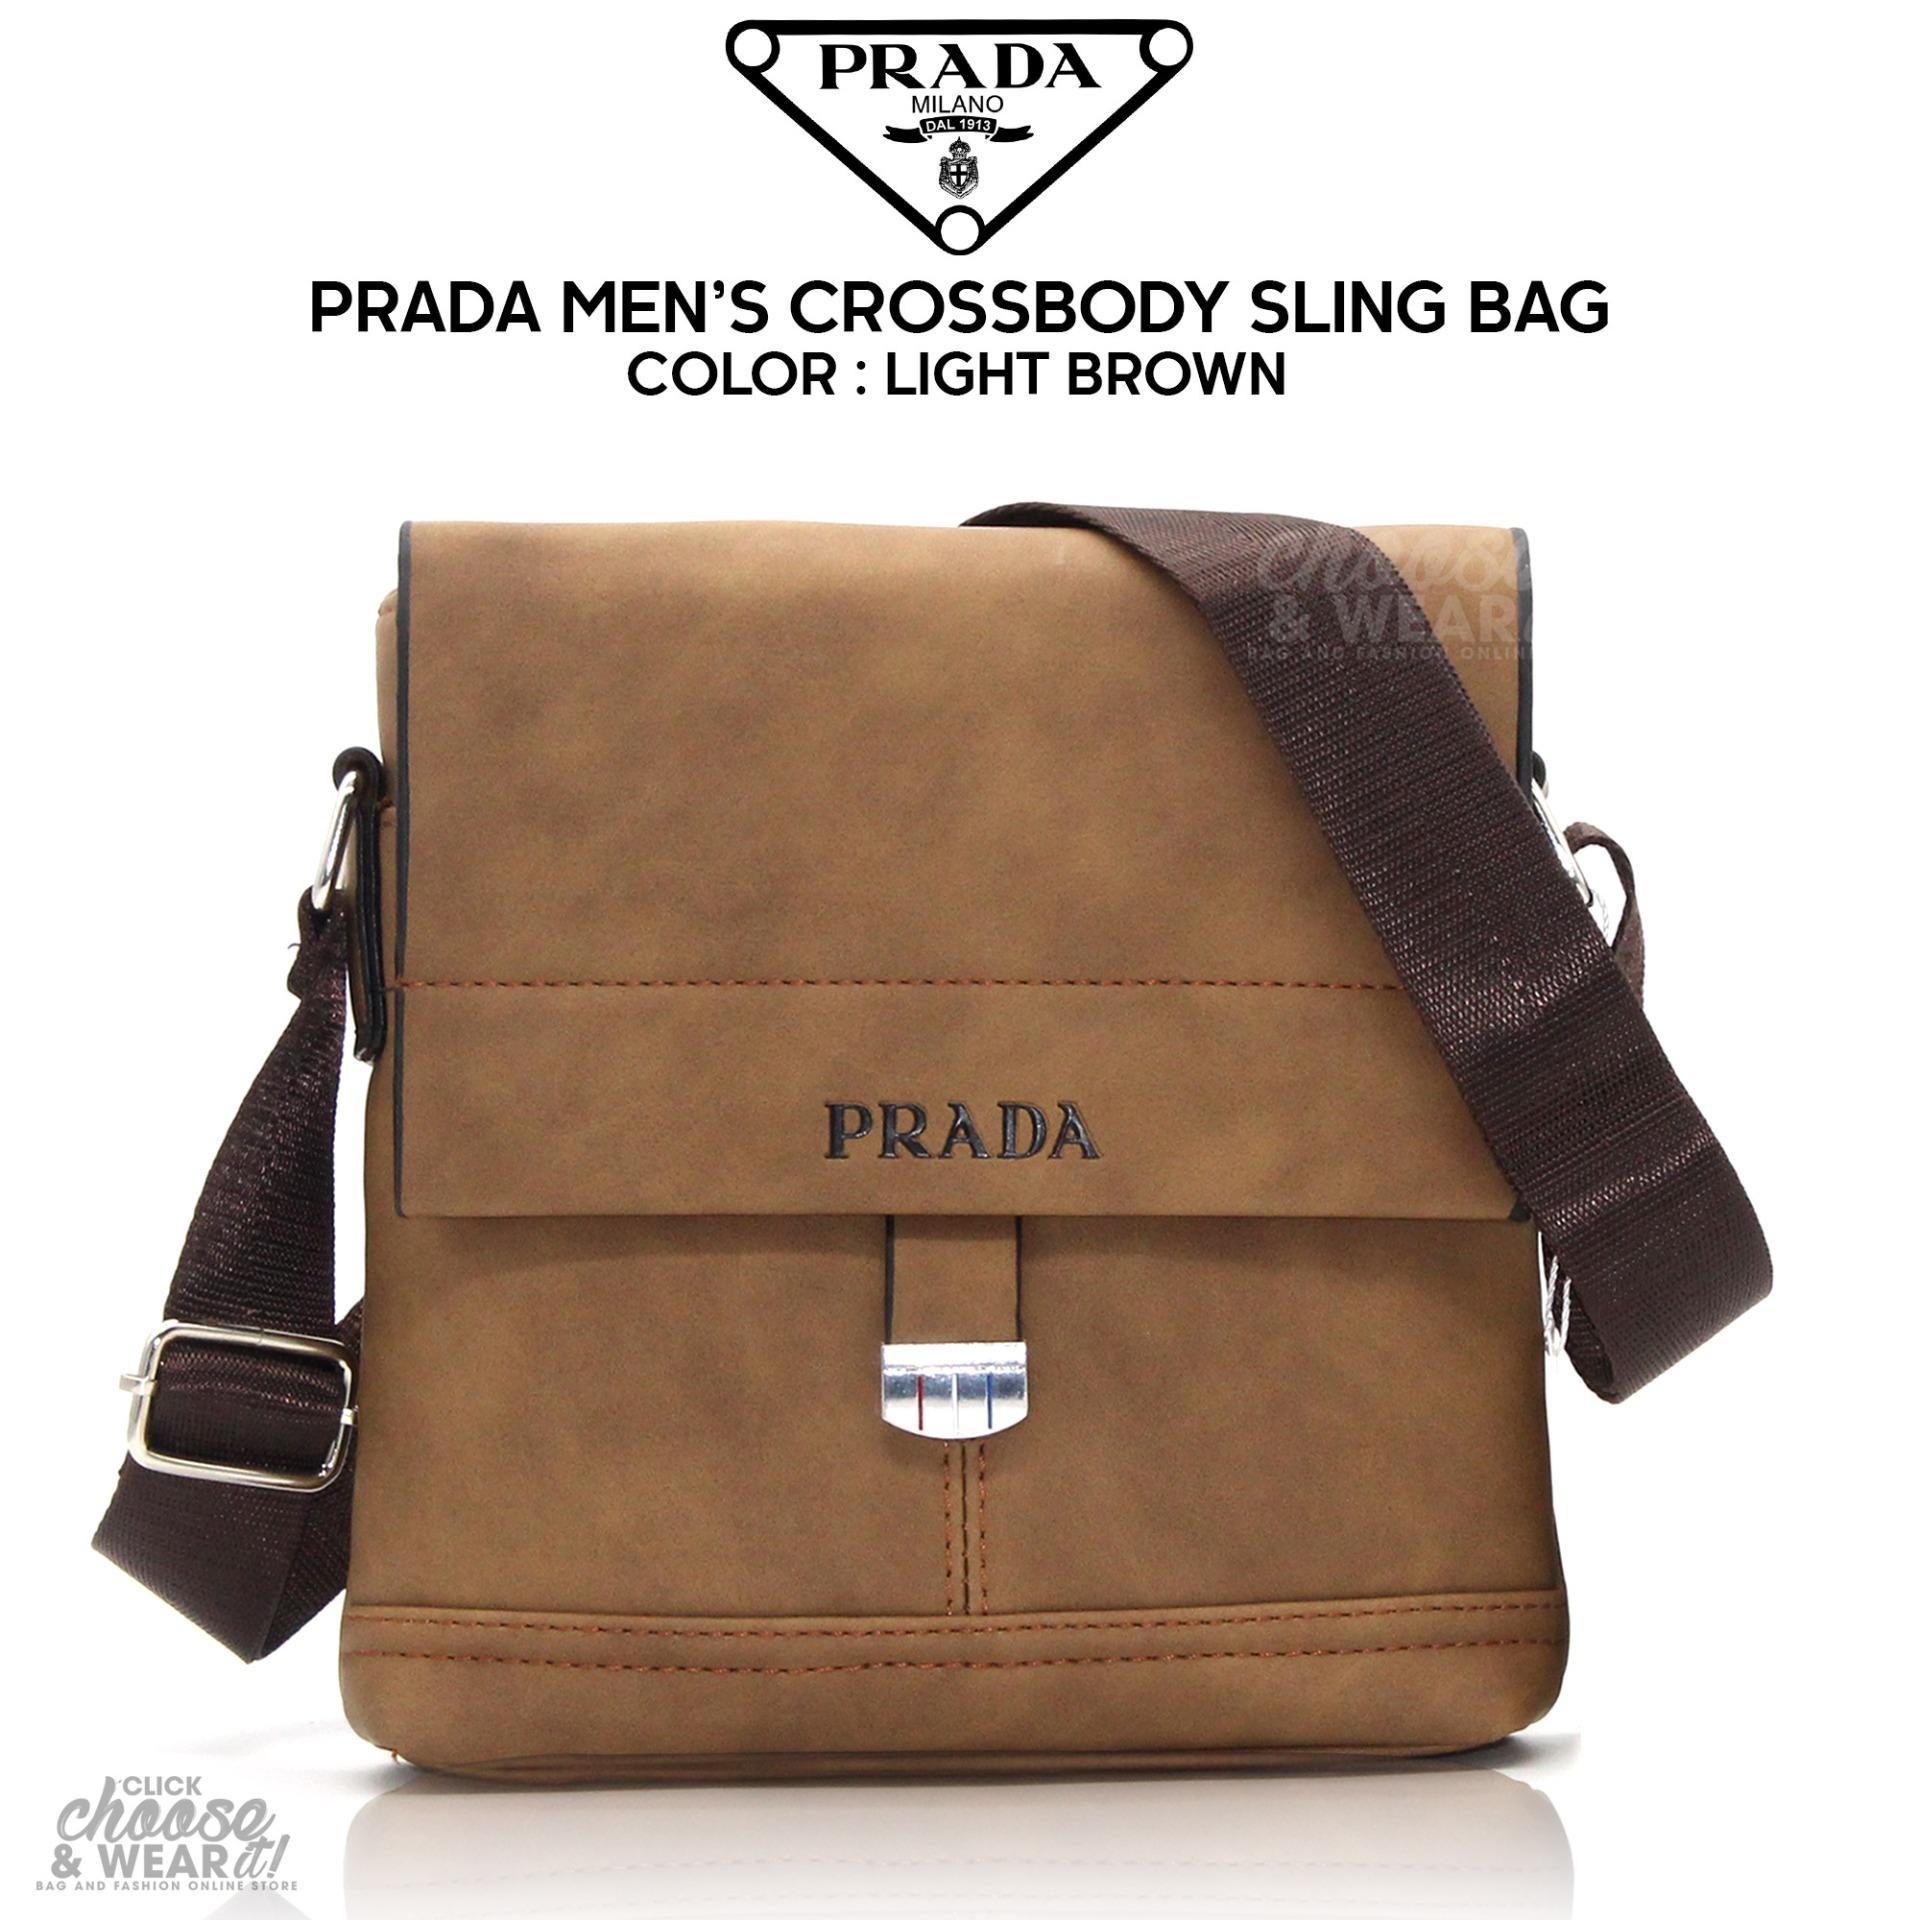 e019b5408223 ... hot prada crossbody messenger bag magnetic closure adjustable strap  light brown 892f6 a0be7